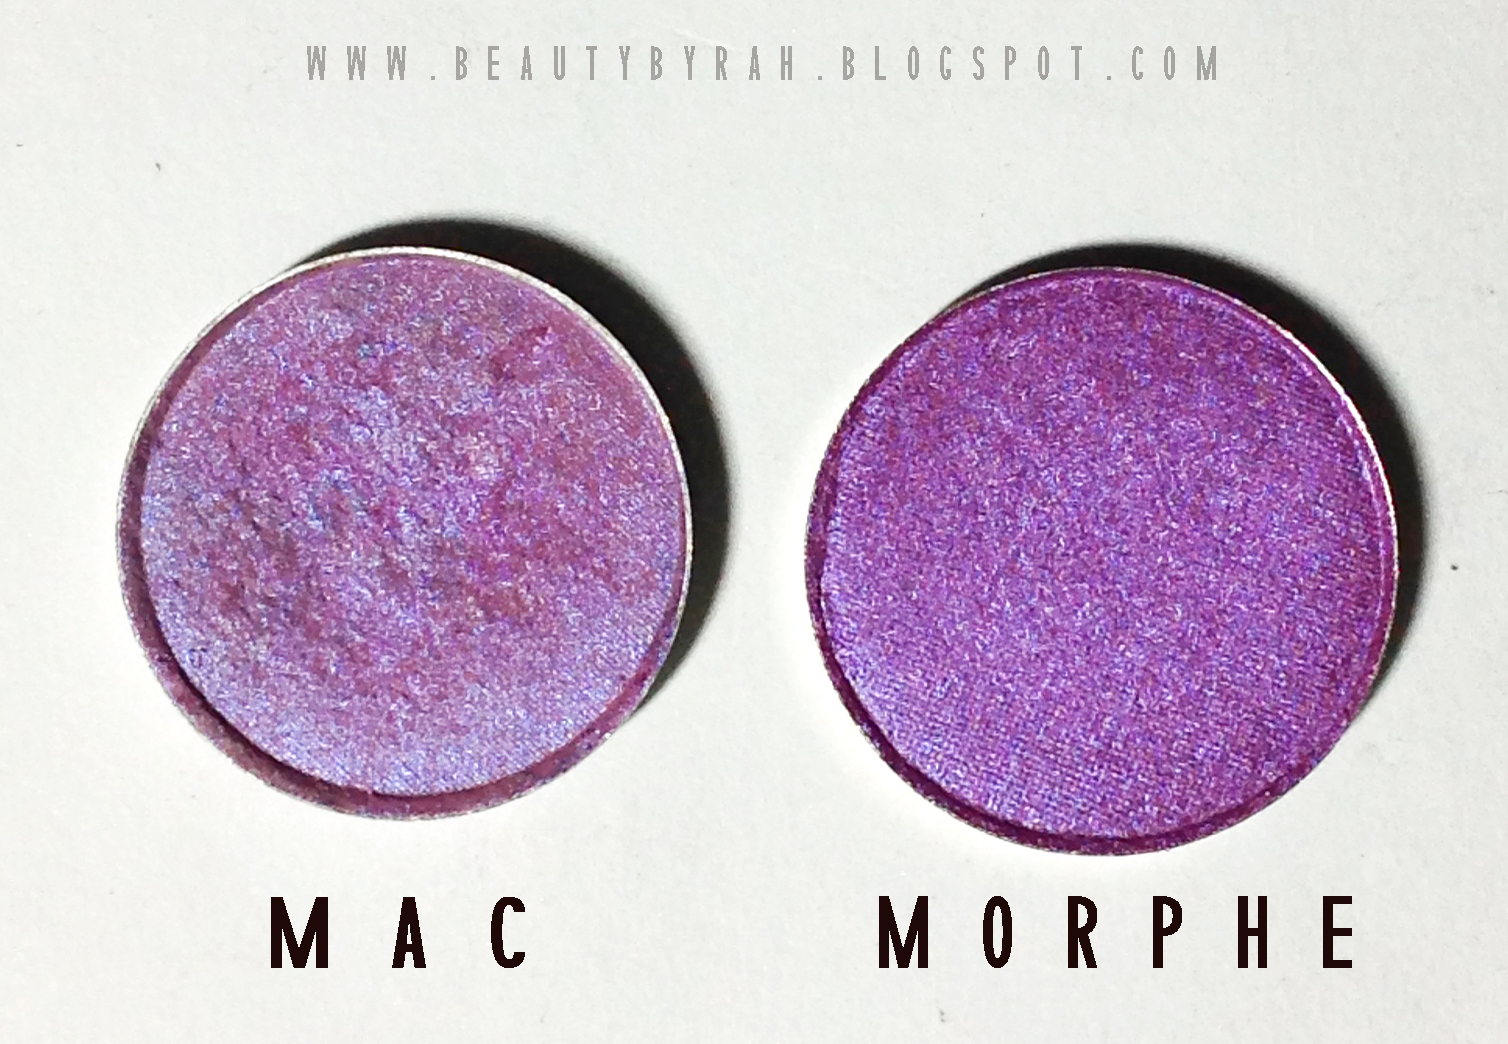 comparison between morphe and mac eyeshadows